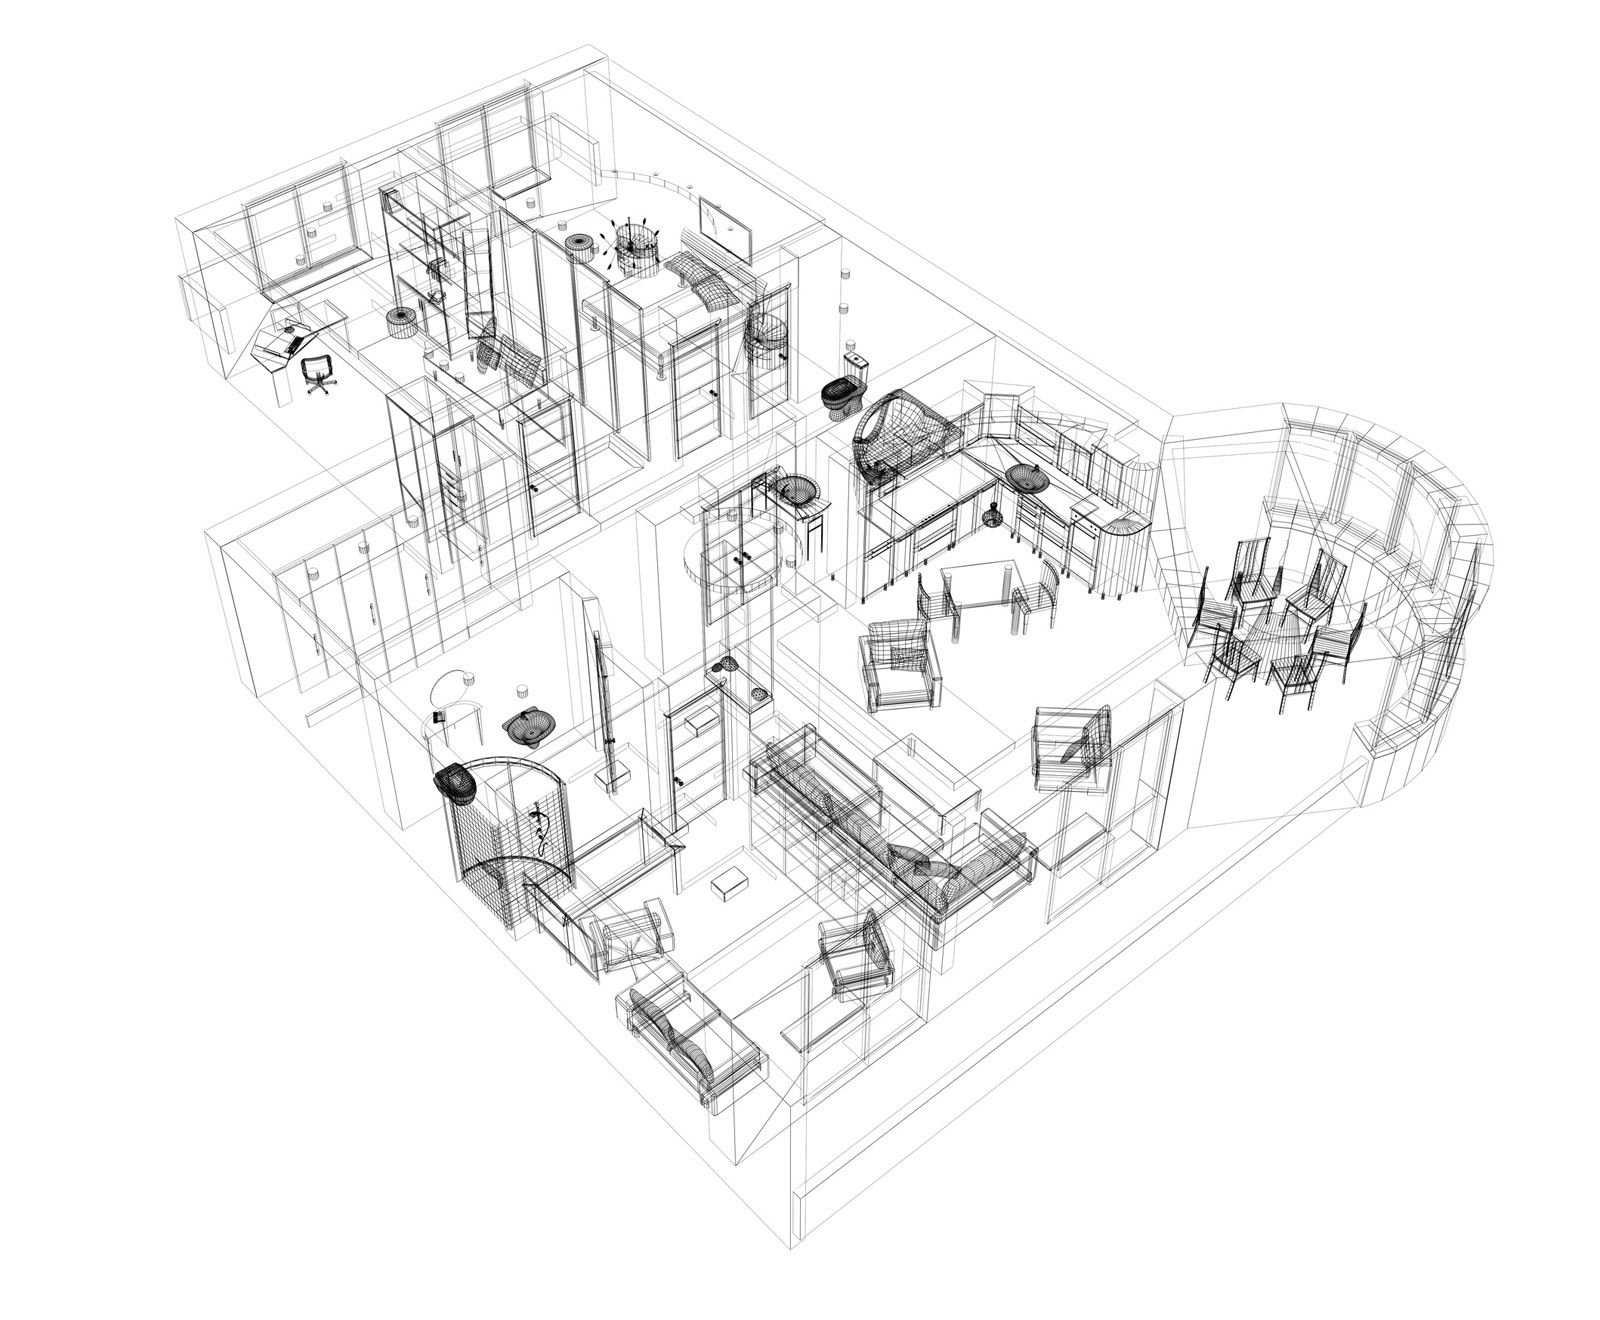 Good 3d Building Scheme And Floor Plans Ideas For House